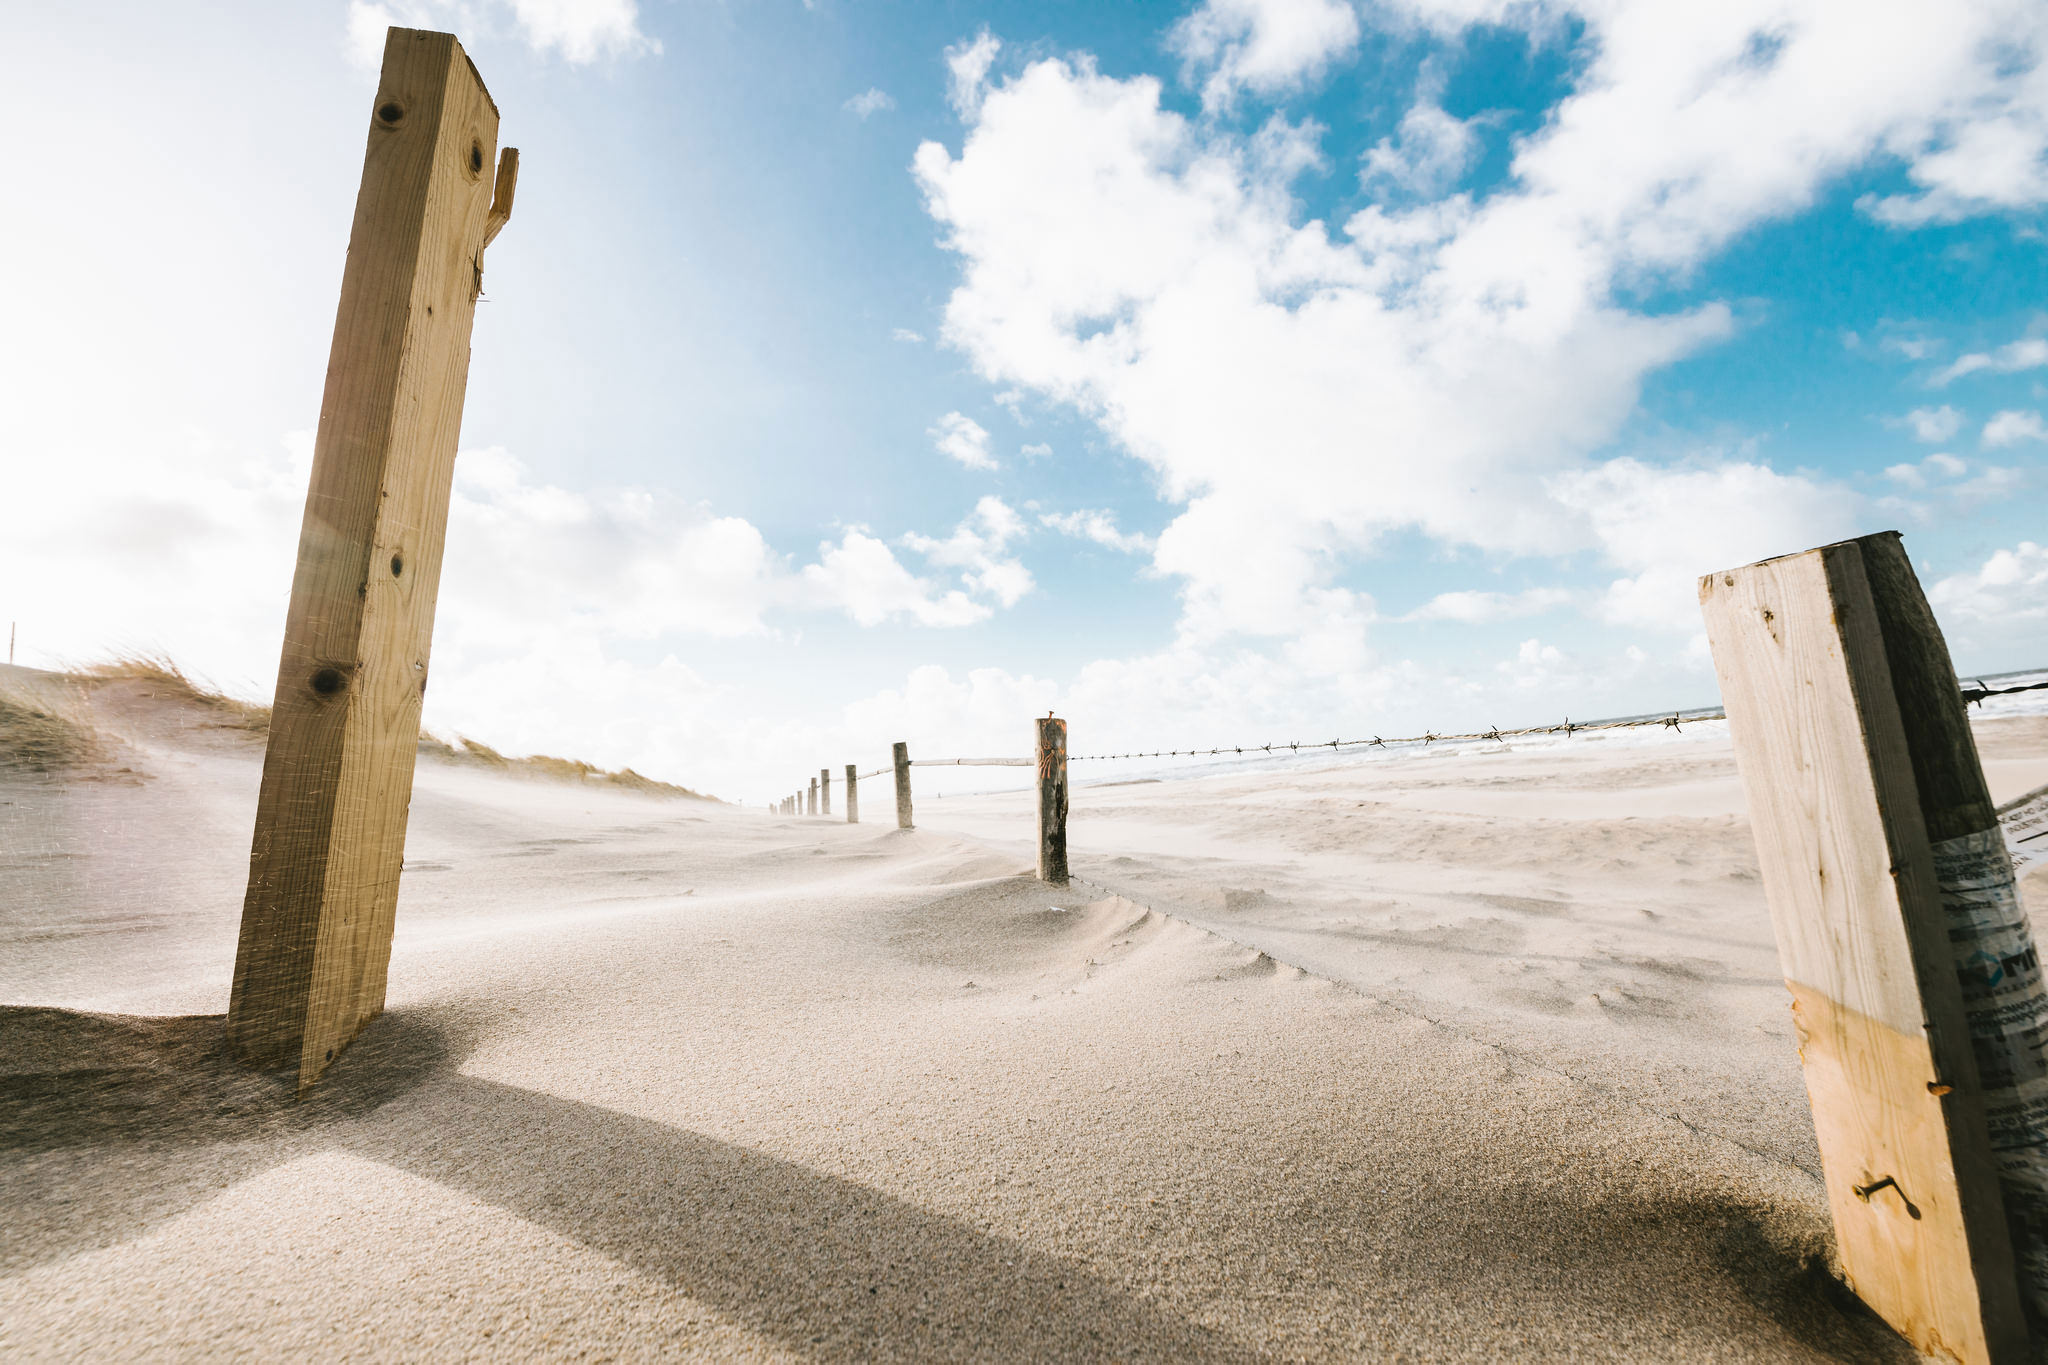 Landschaftsfotografie fotograf filmemacher frankfurt patrick schmetzer drohne landschaft natur 7